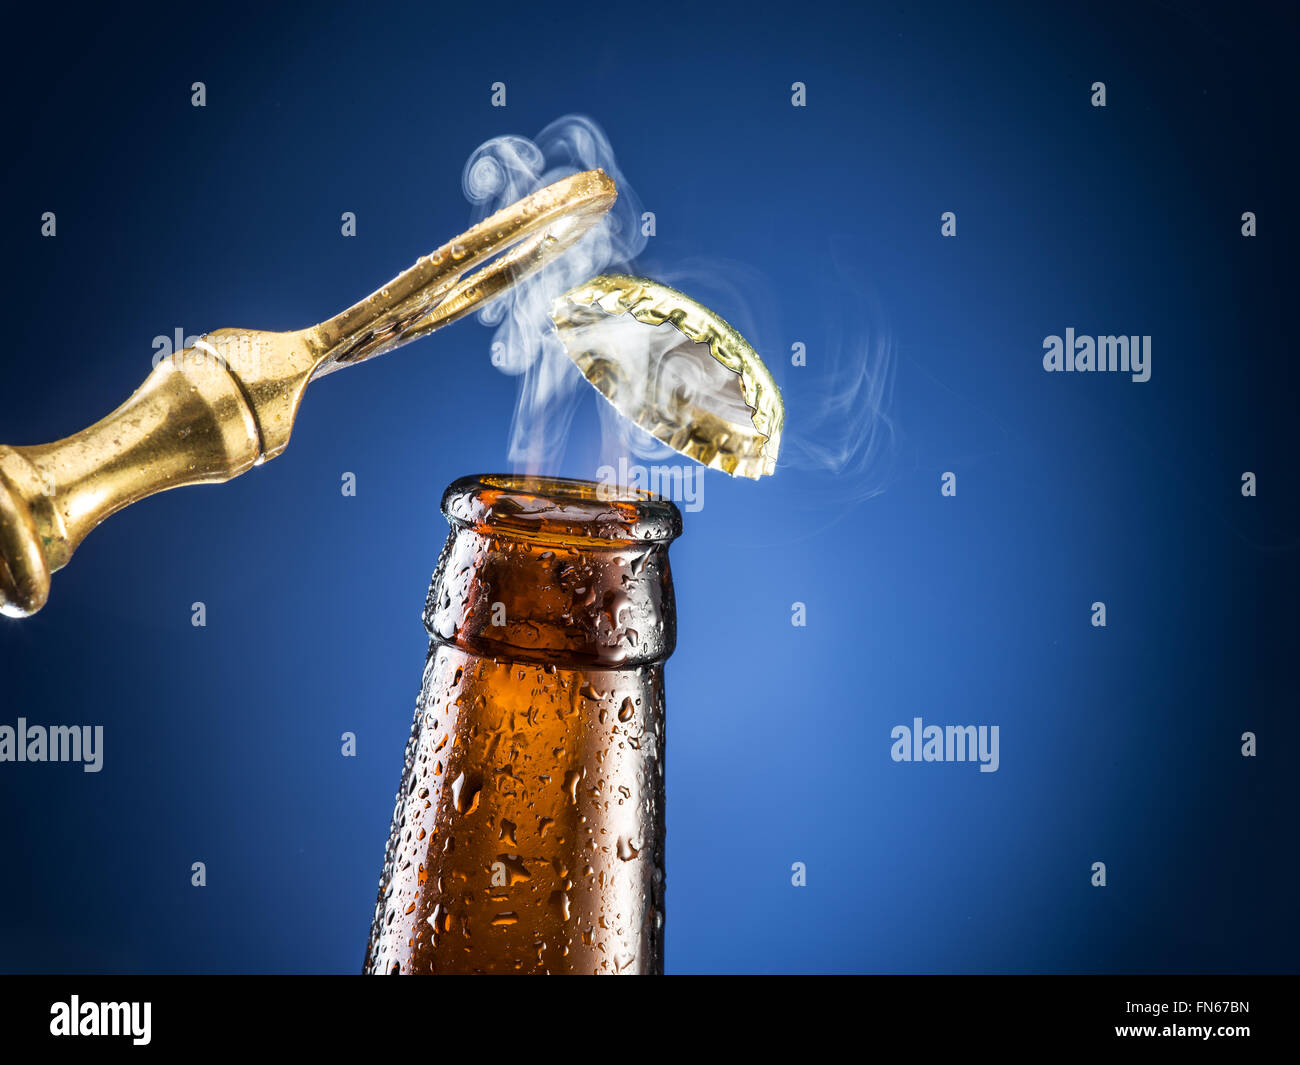 Eröffnung des Bier-Kappe mit dem Gas-Ausgang. Stockbild